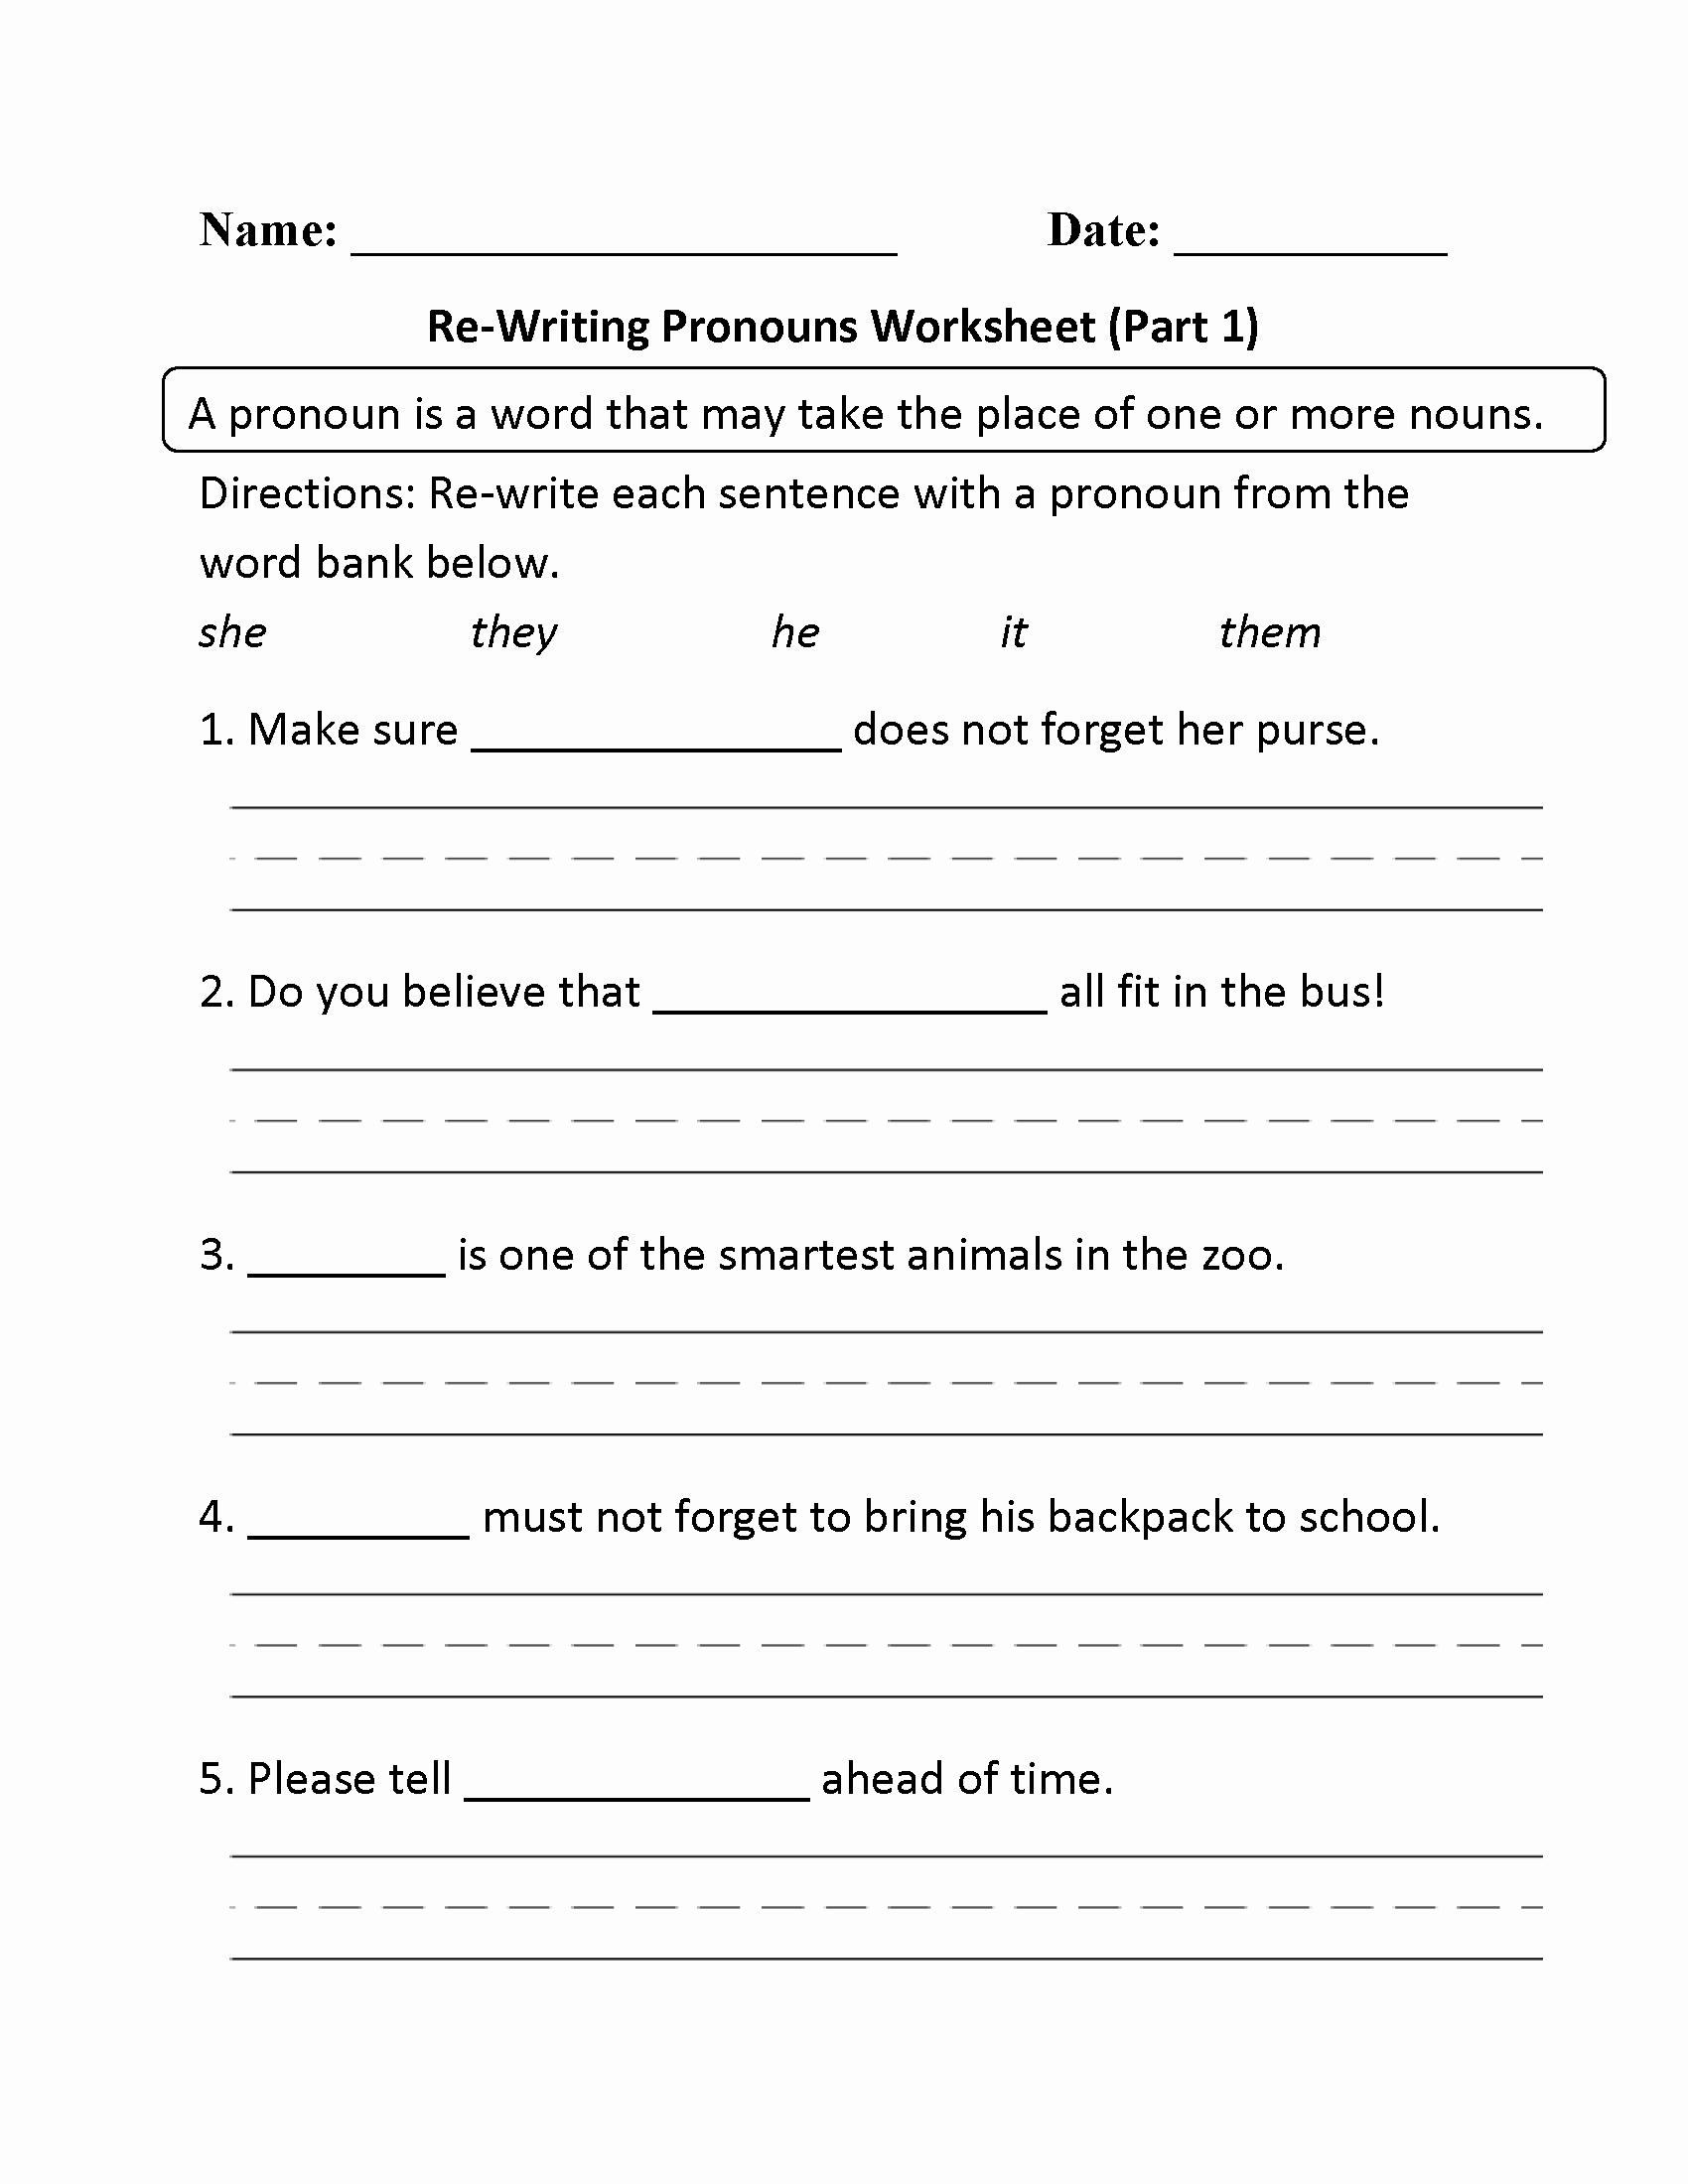 Pronoun Worksheets Second Grade Inspirational Free Printable Pronoun Worksheets for 2nd Grade